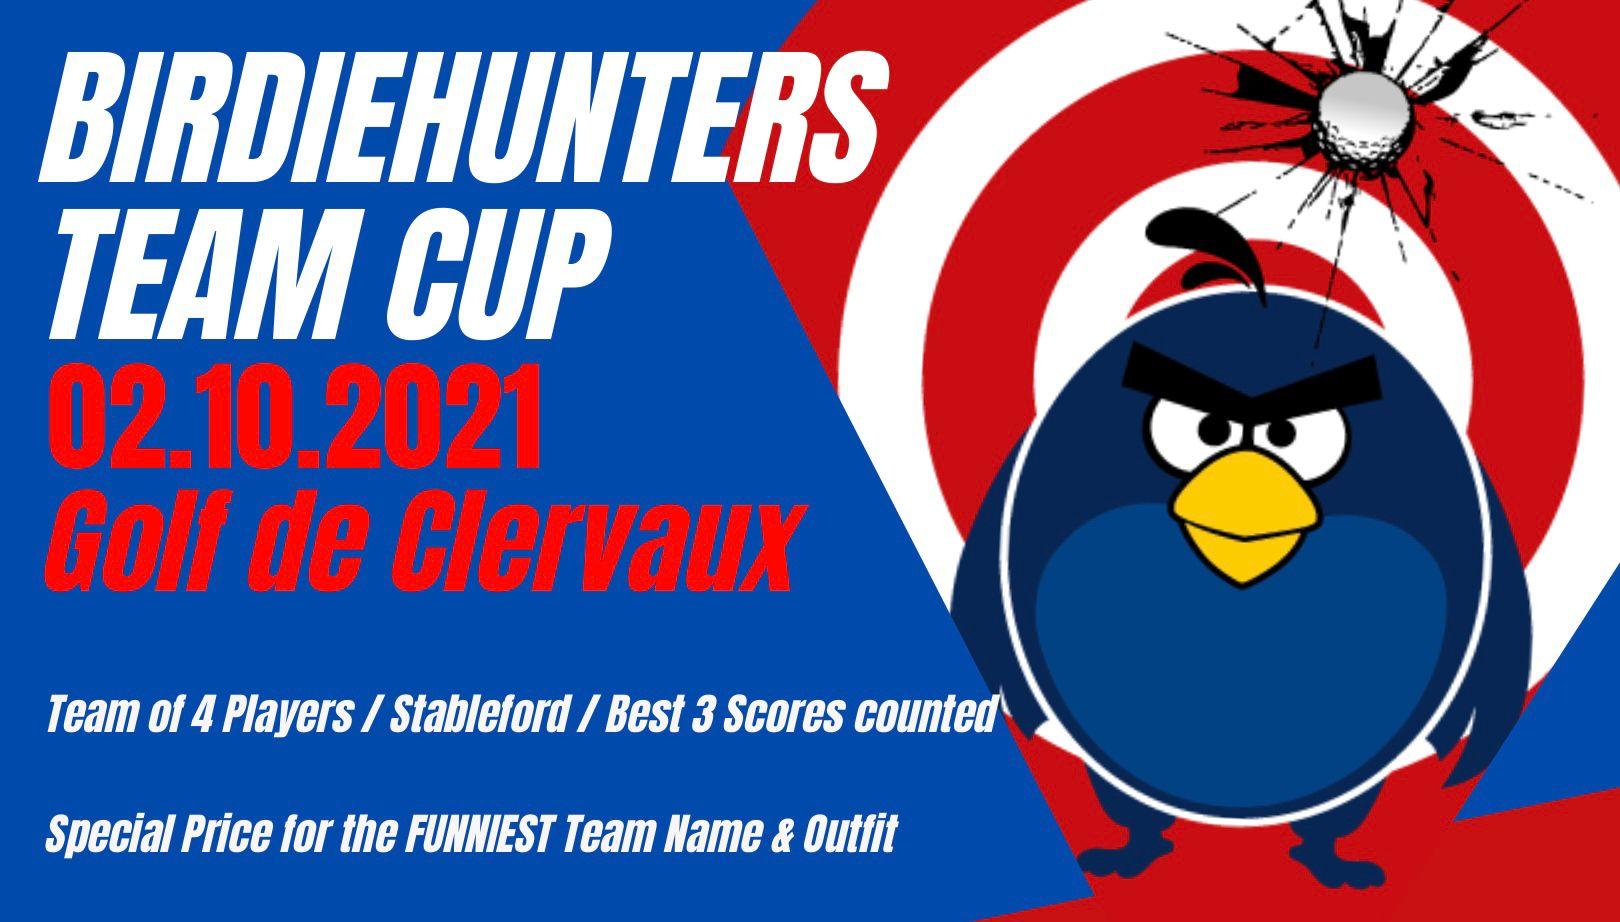 REGISTRATION TEAM CUP  2021